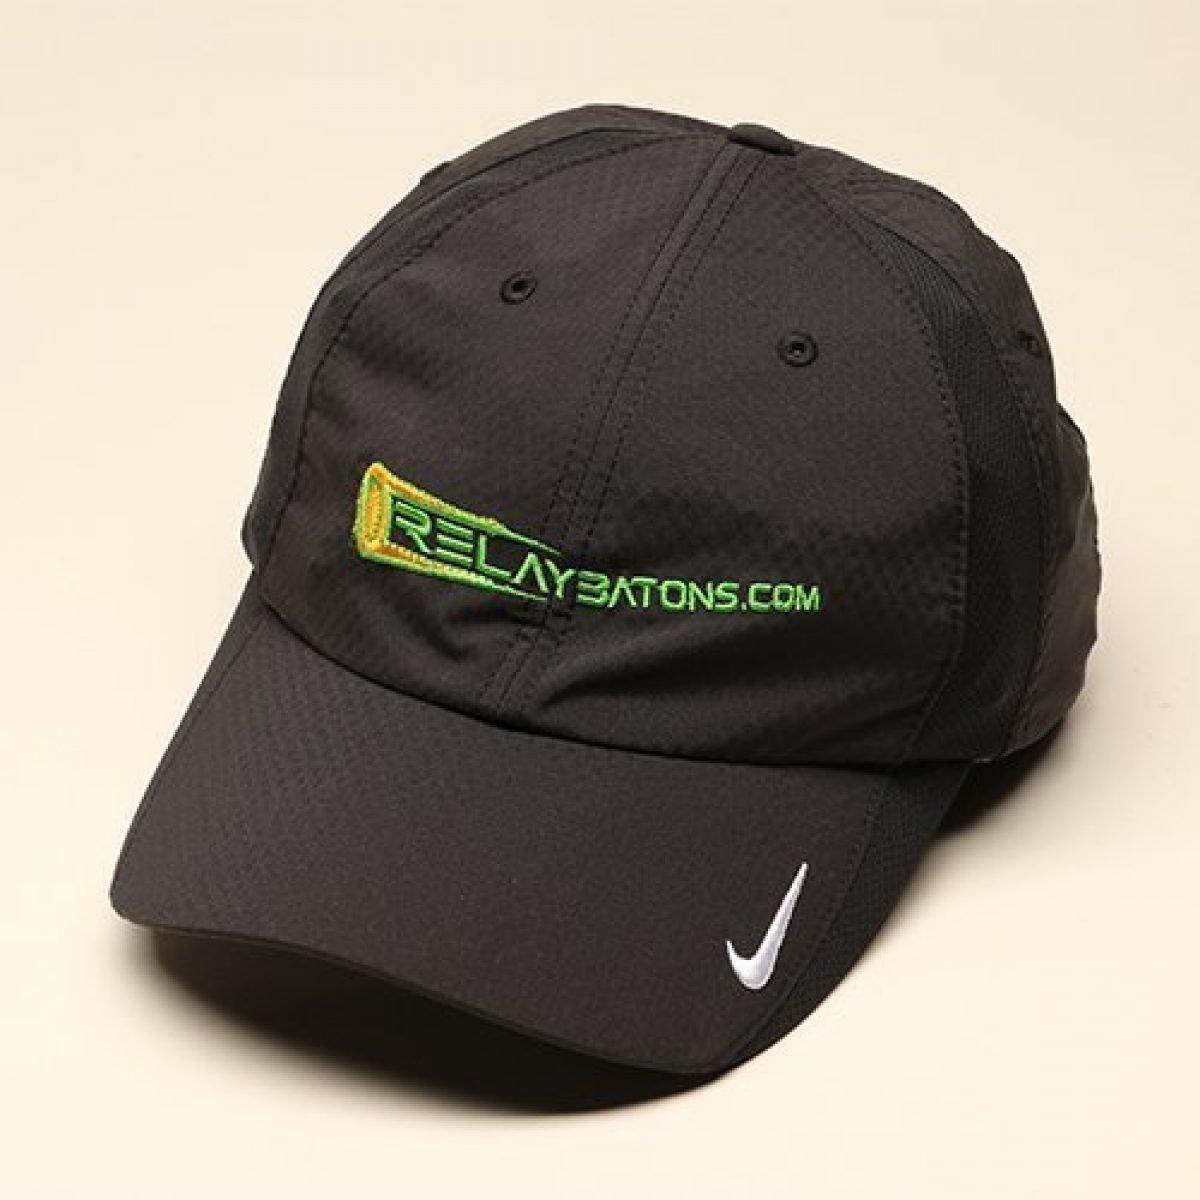 Cap (RelayBatons.com)